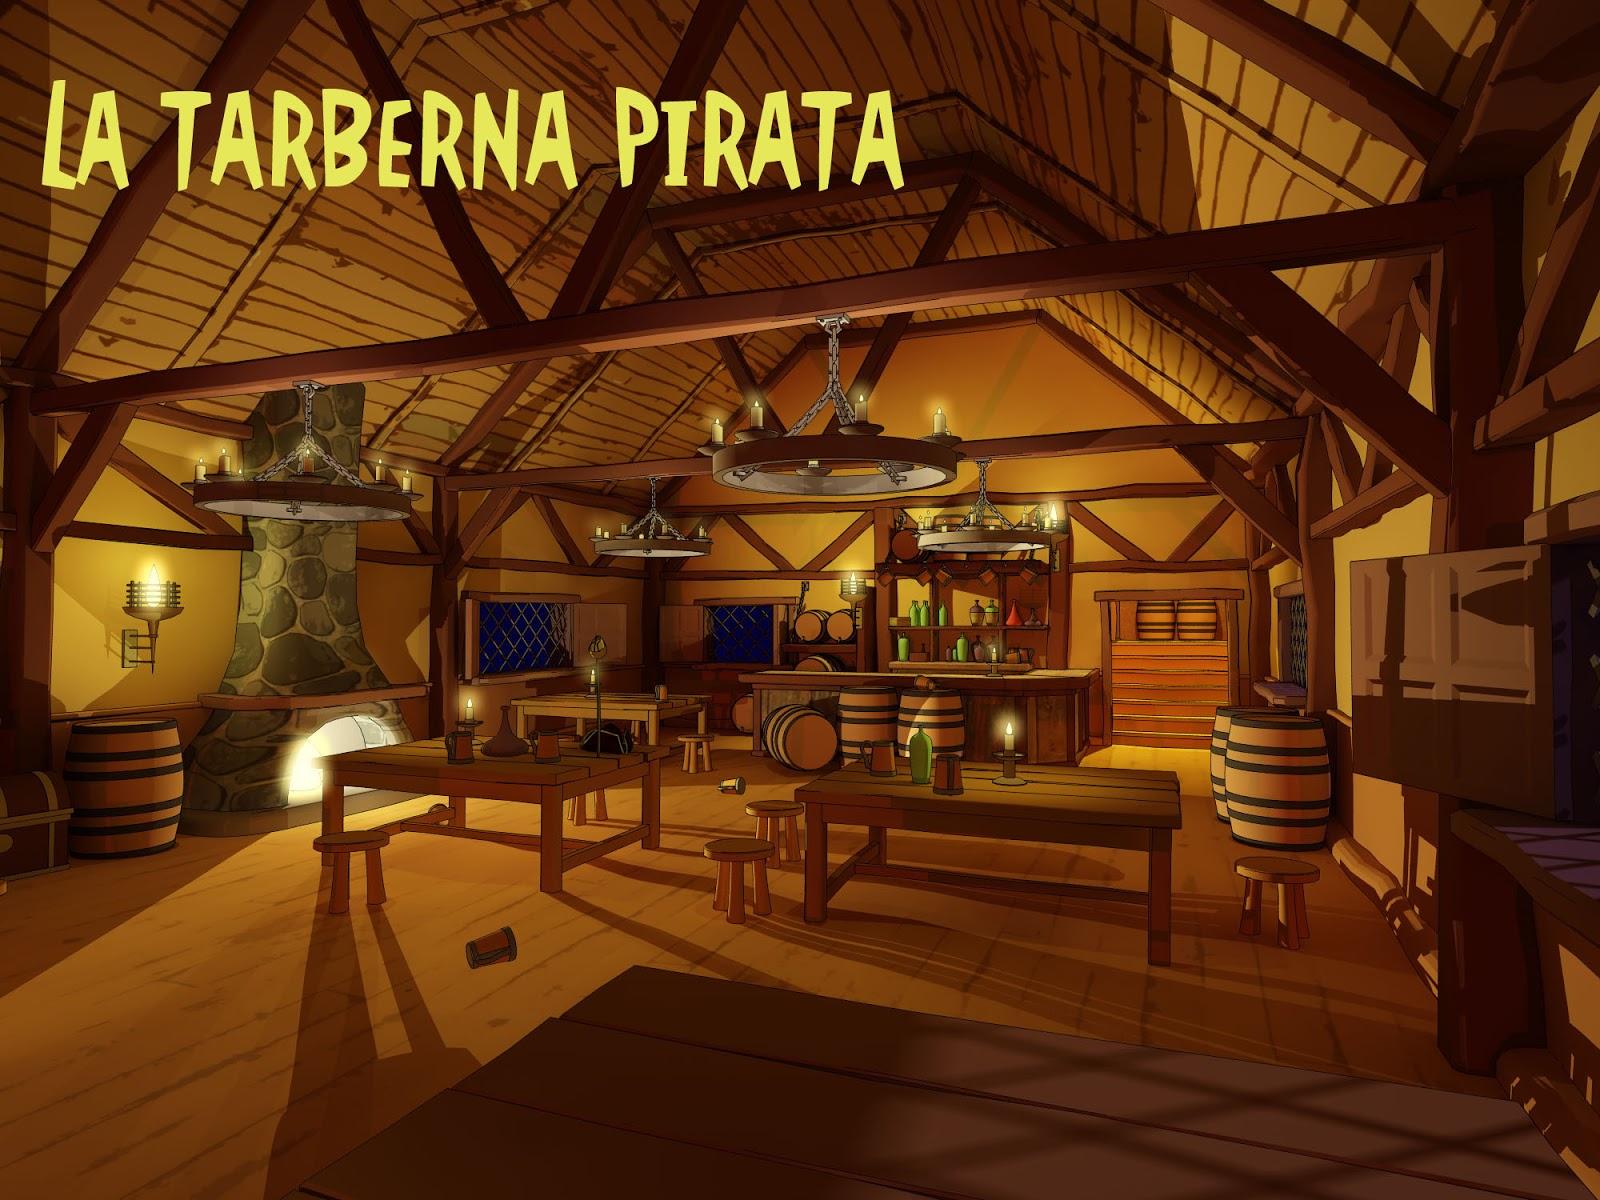 visita la taberna pirata